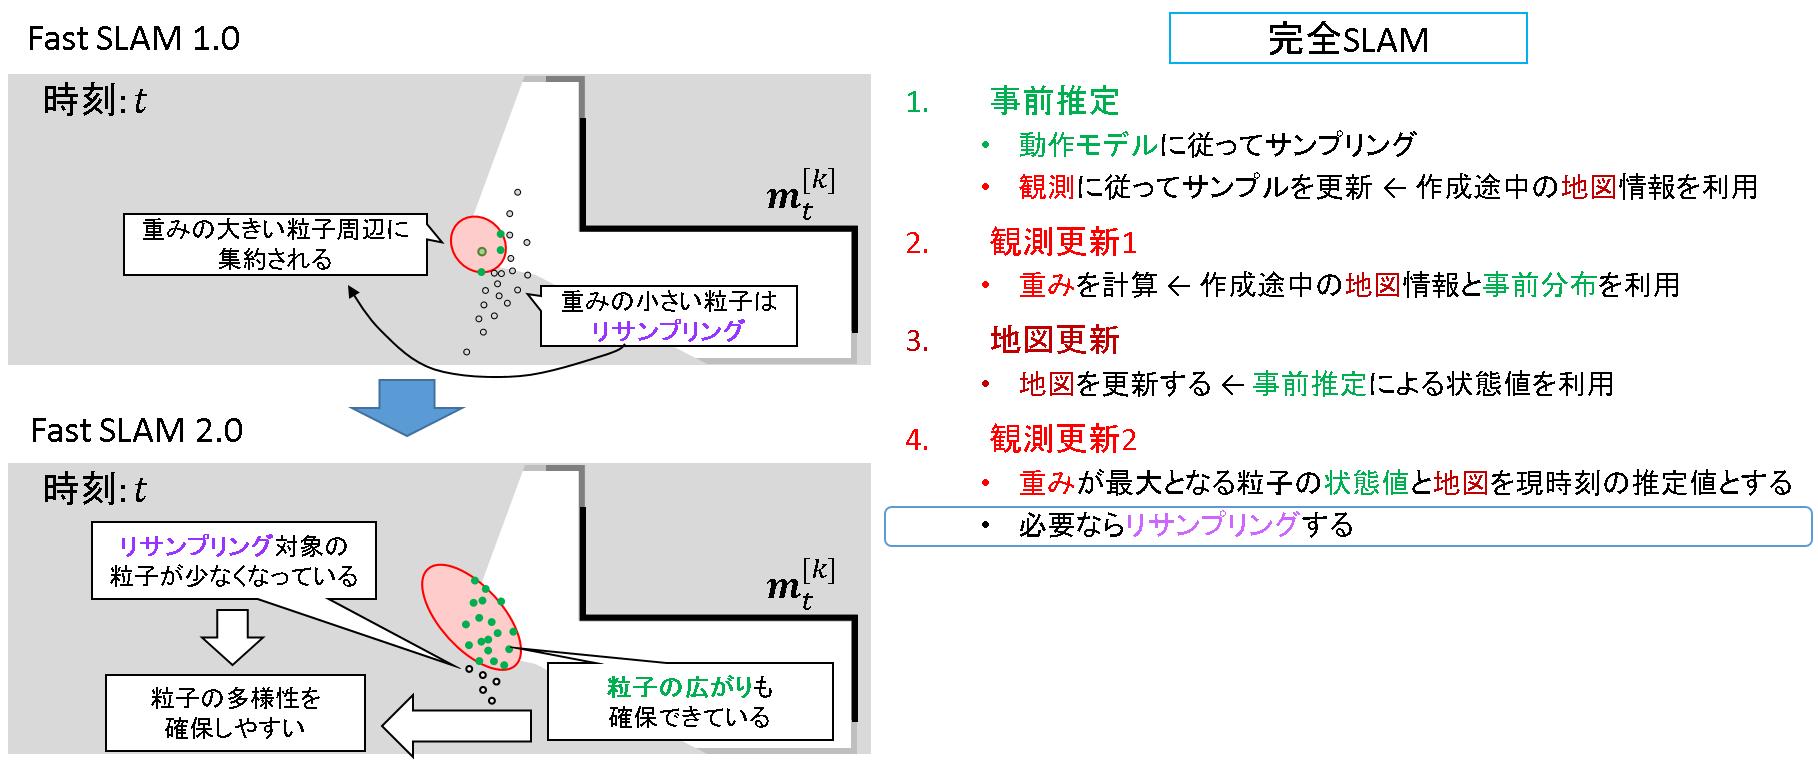 81_FastSLAM2.0_観測更新2_2.png